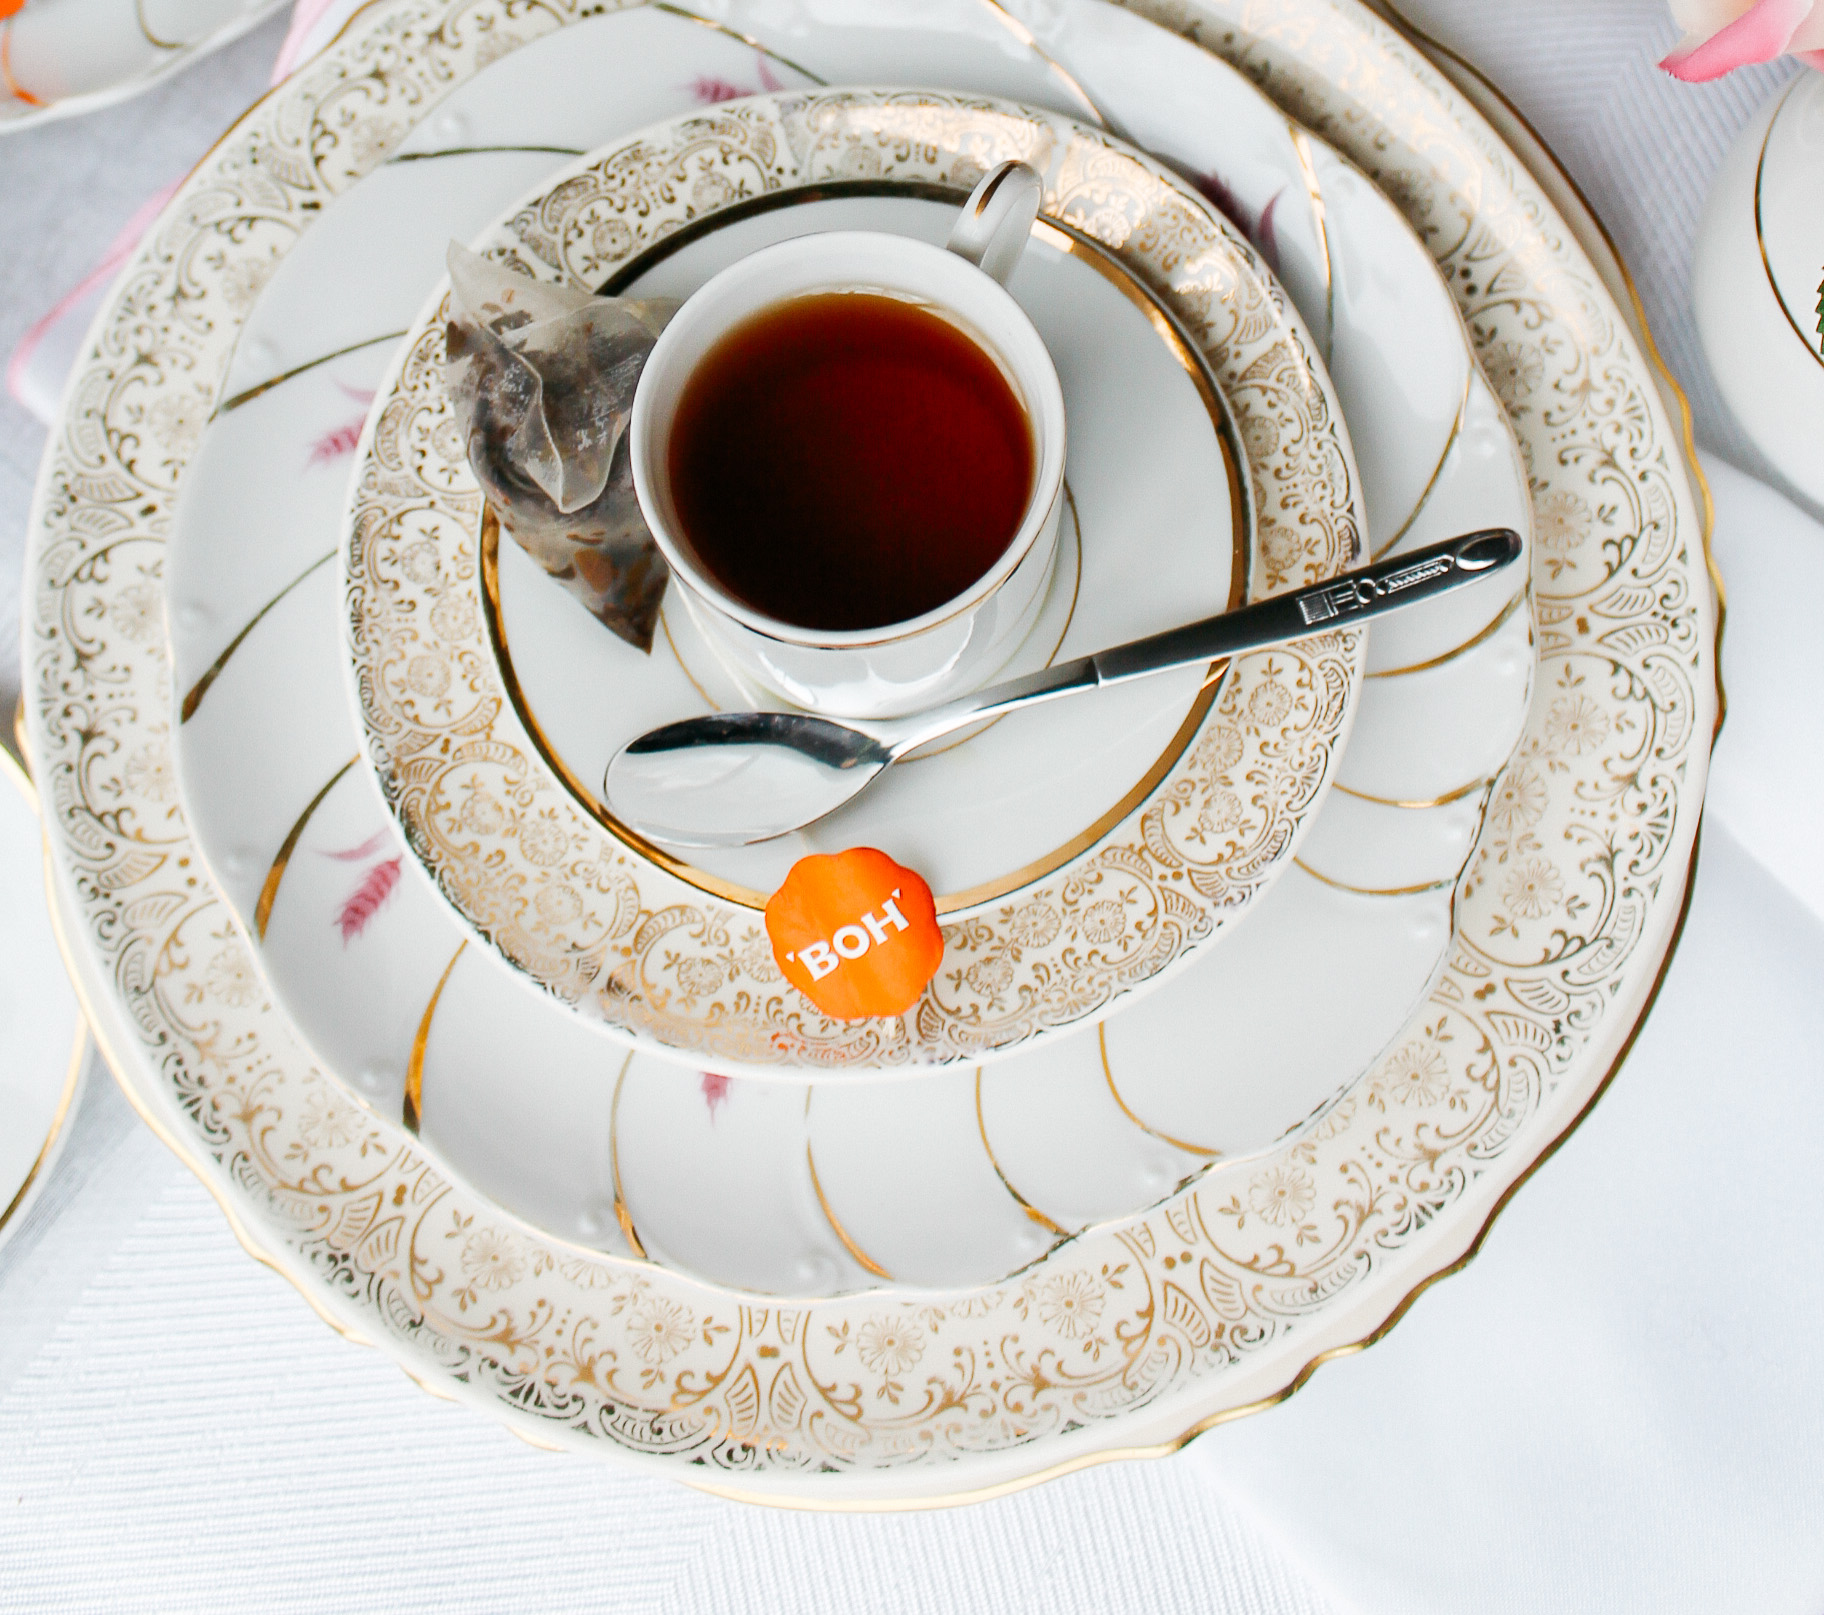 BOH Garden Teas // Garden Tea Decor, Styled by Always Creating Studio